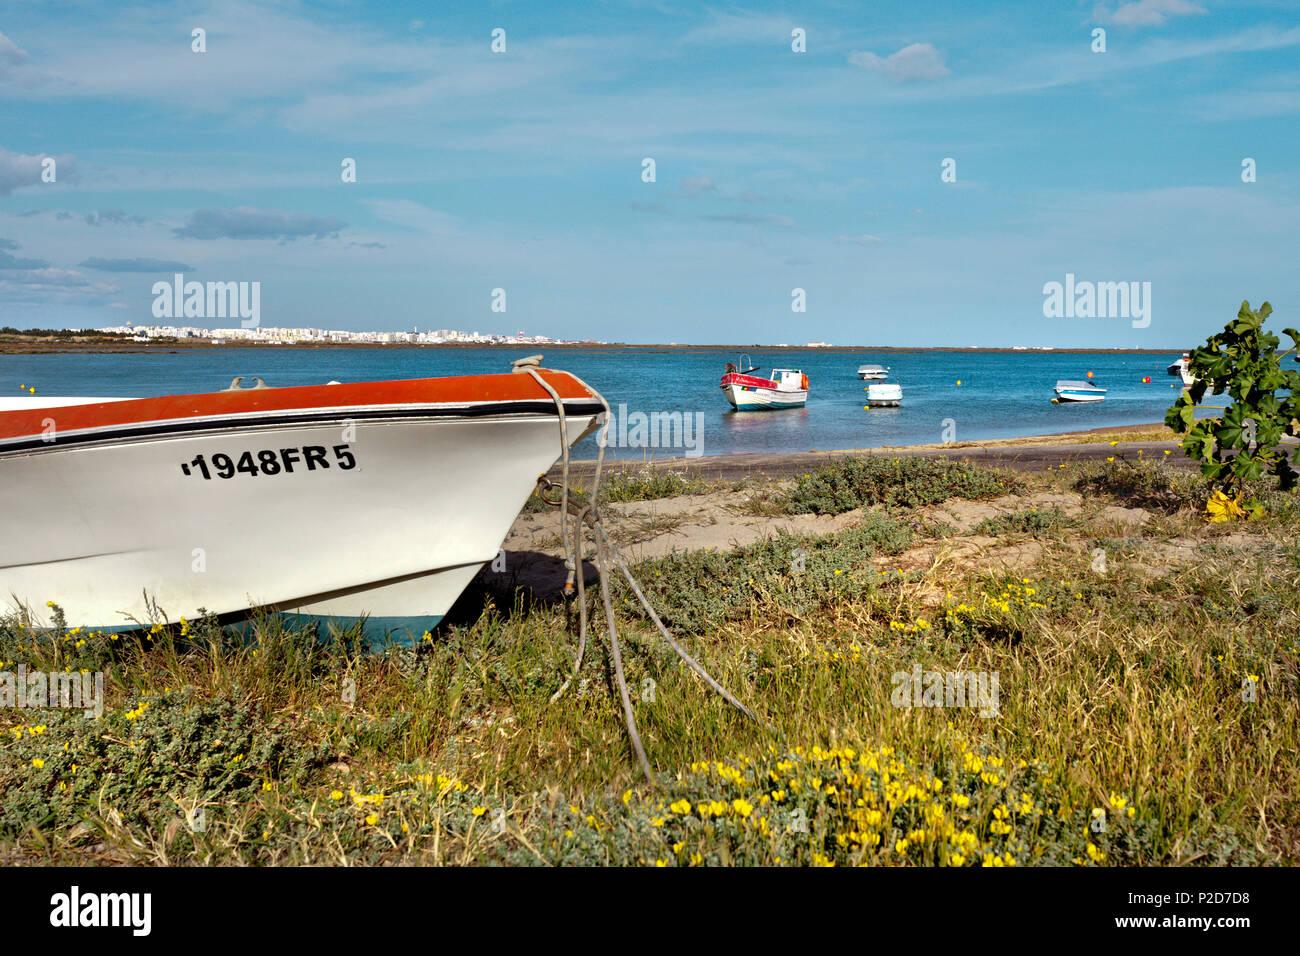 Boat on the beach, lagoon, Praia de Faro, Faro, Algarve, Portugal - Stock Image